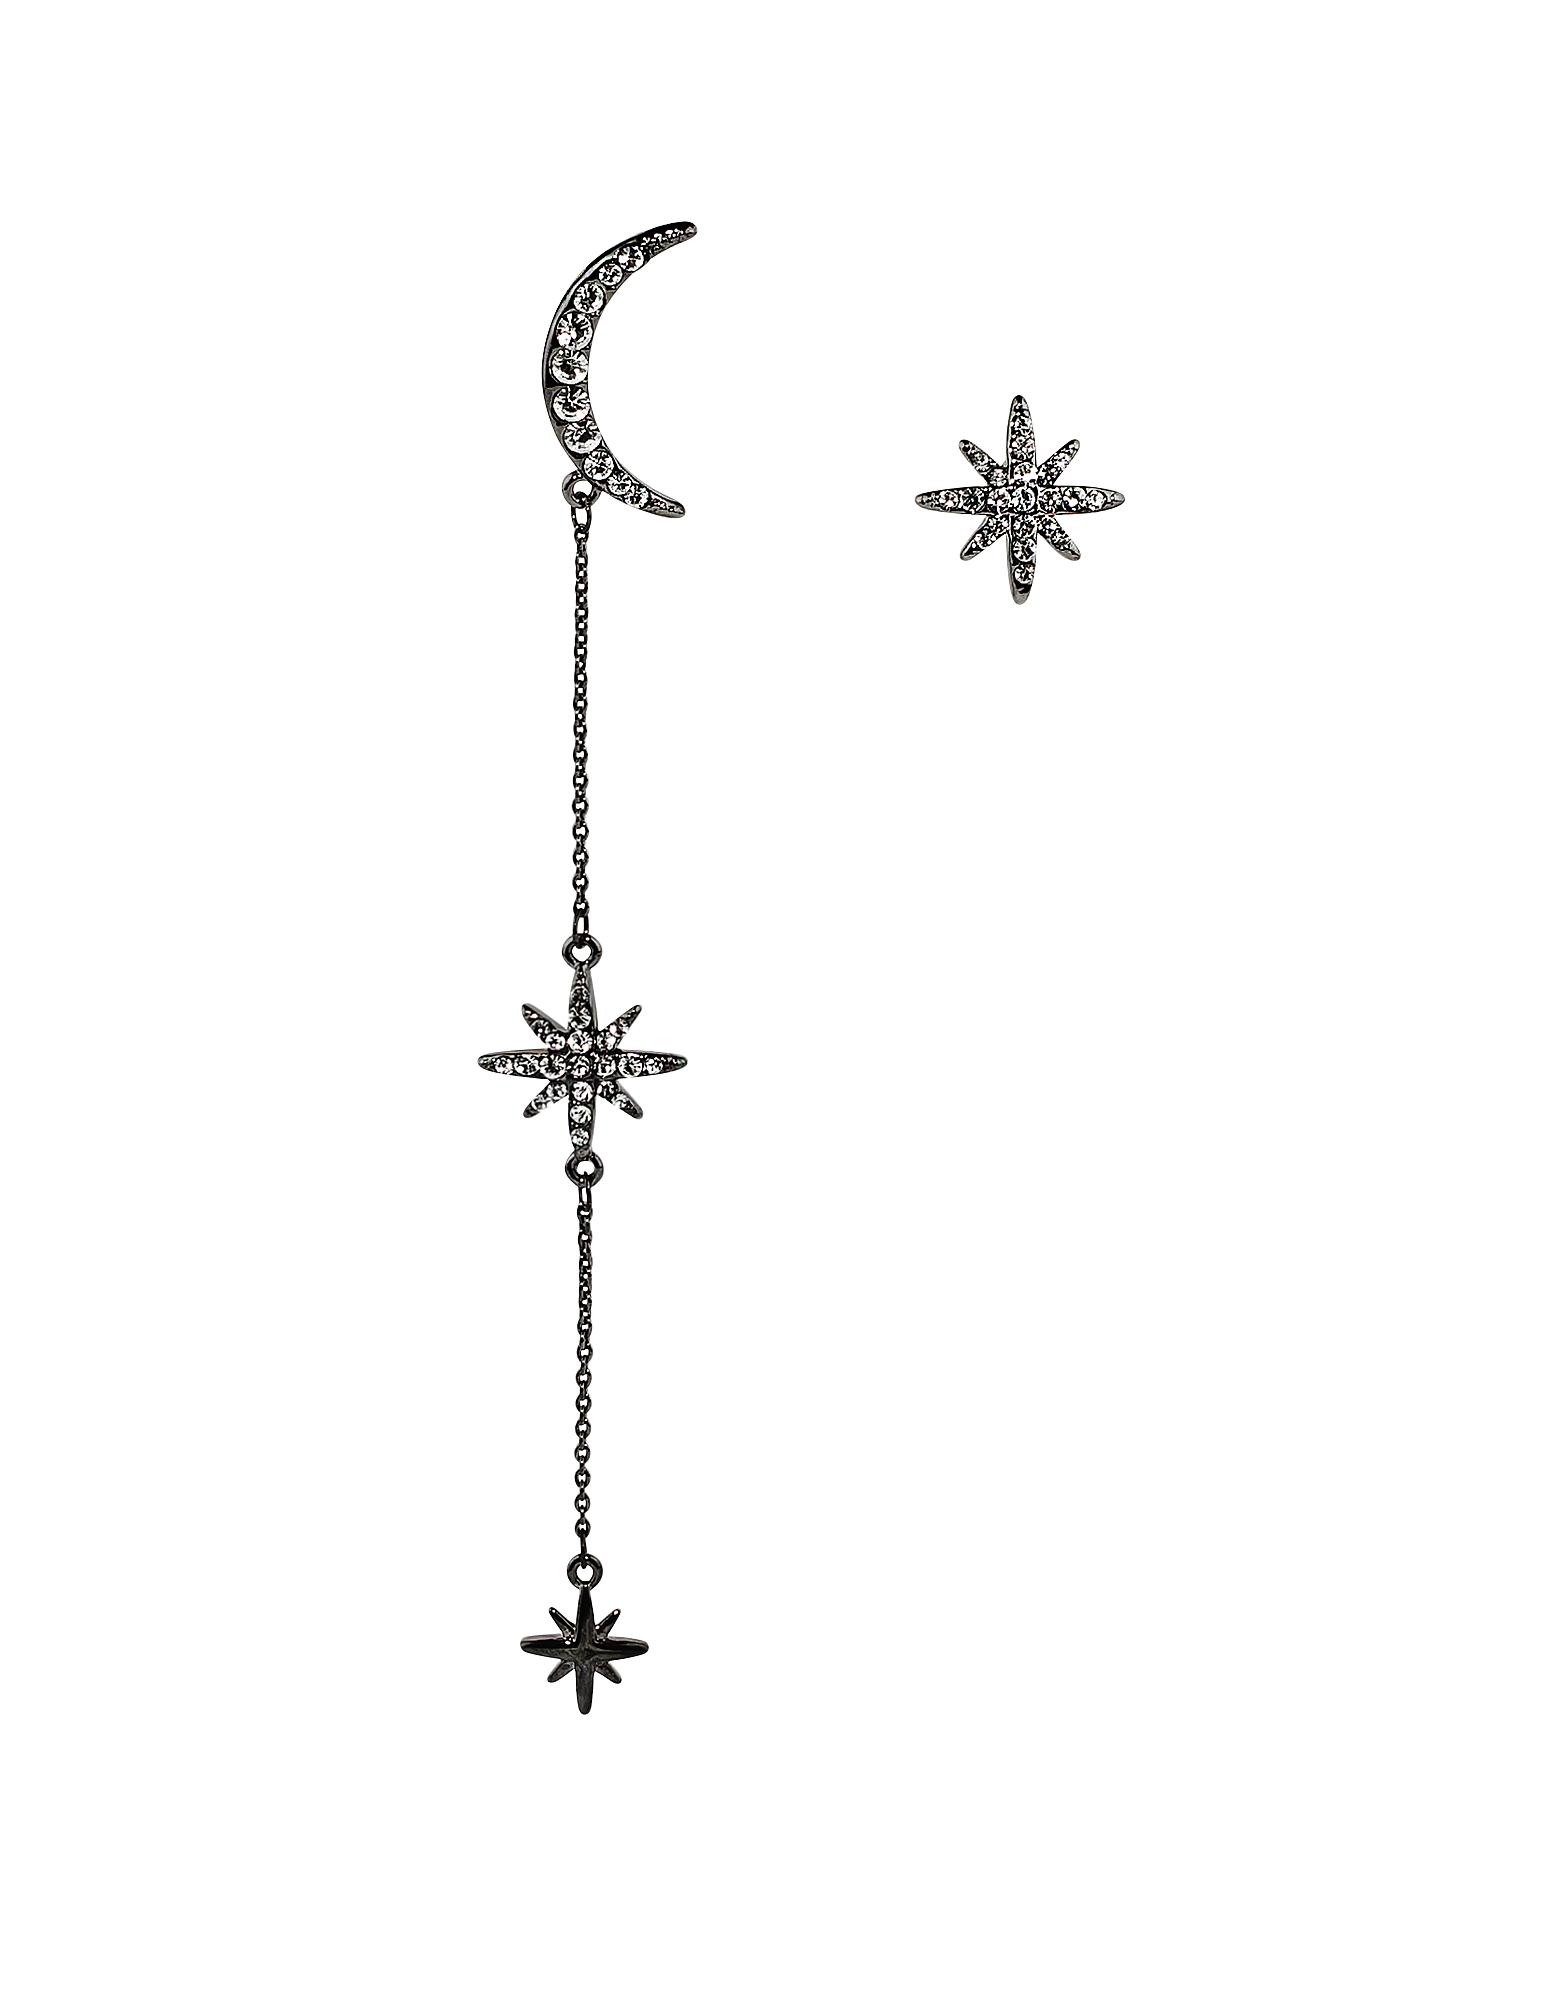 Federica Tosi Earrings, Long Moon Star Earrings